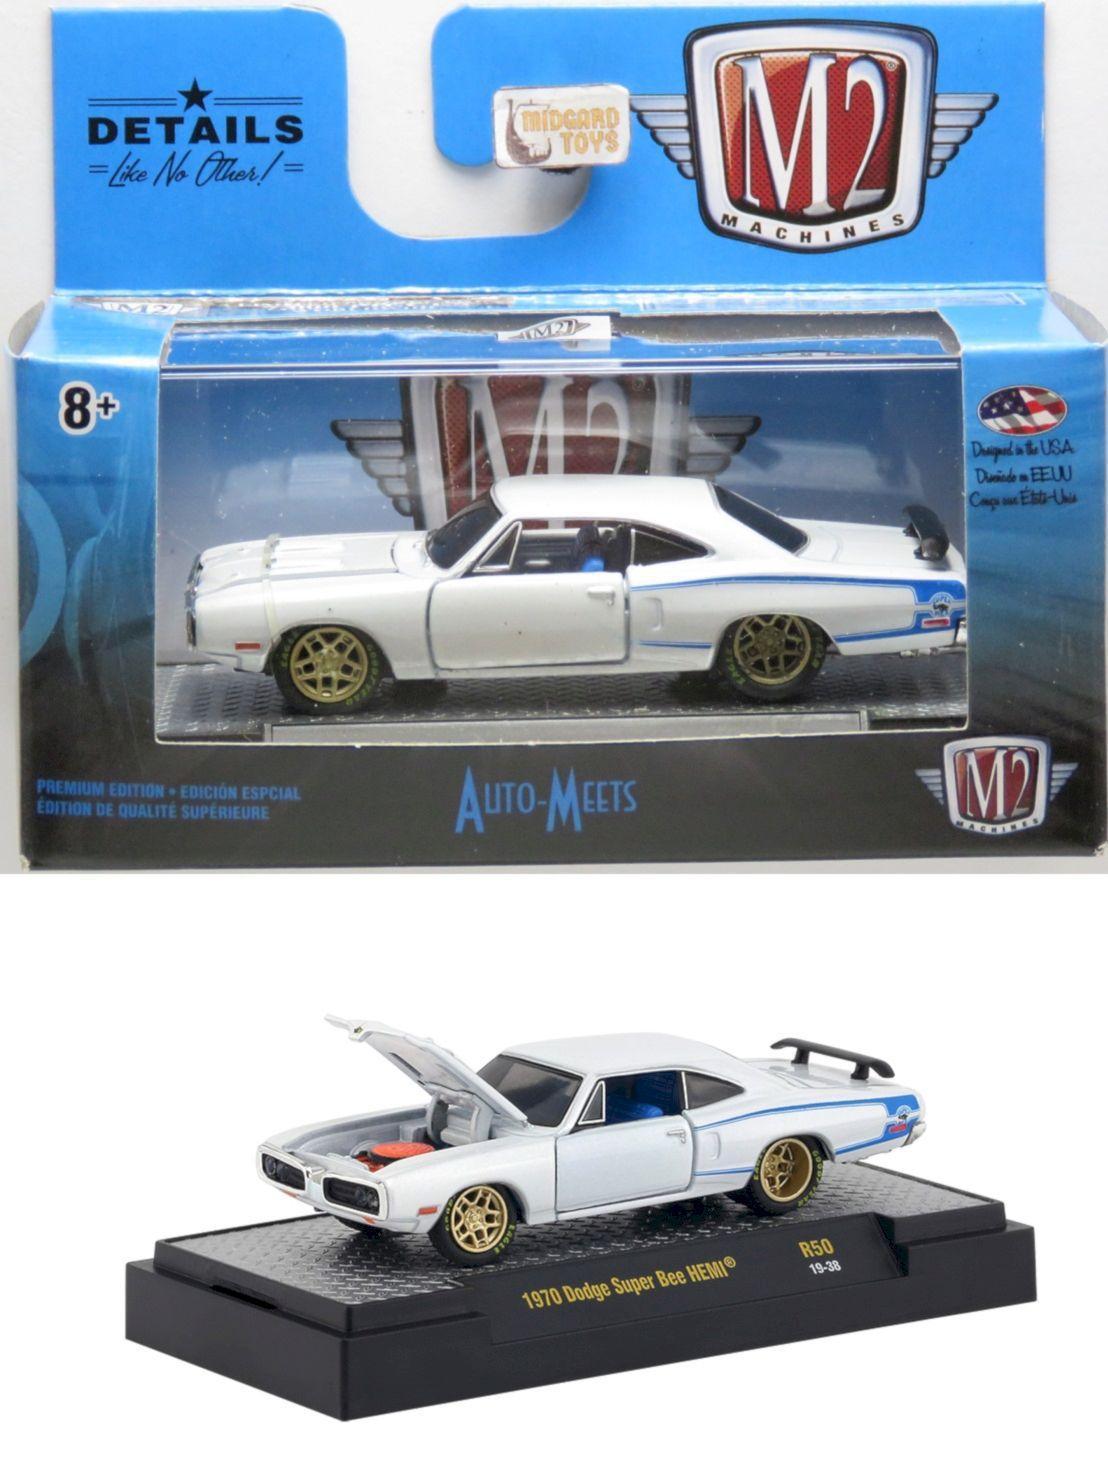 1970 Dodge Super Bee Hemi Auto Meets Detroit Muscle Release 50 1 64 M2 Machines Miniaturas De Carros Magazine Luiza